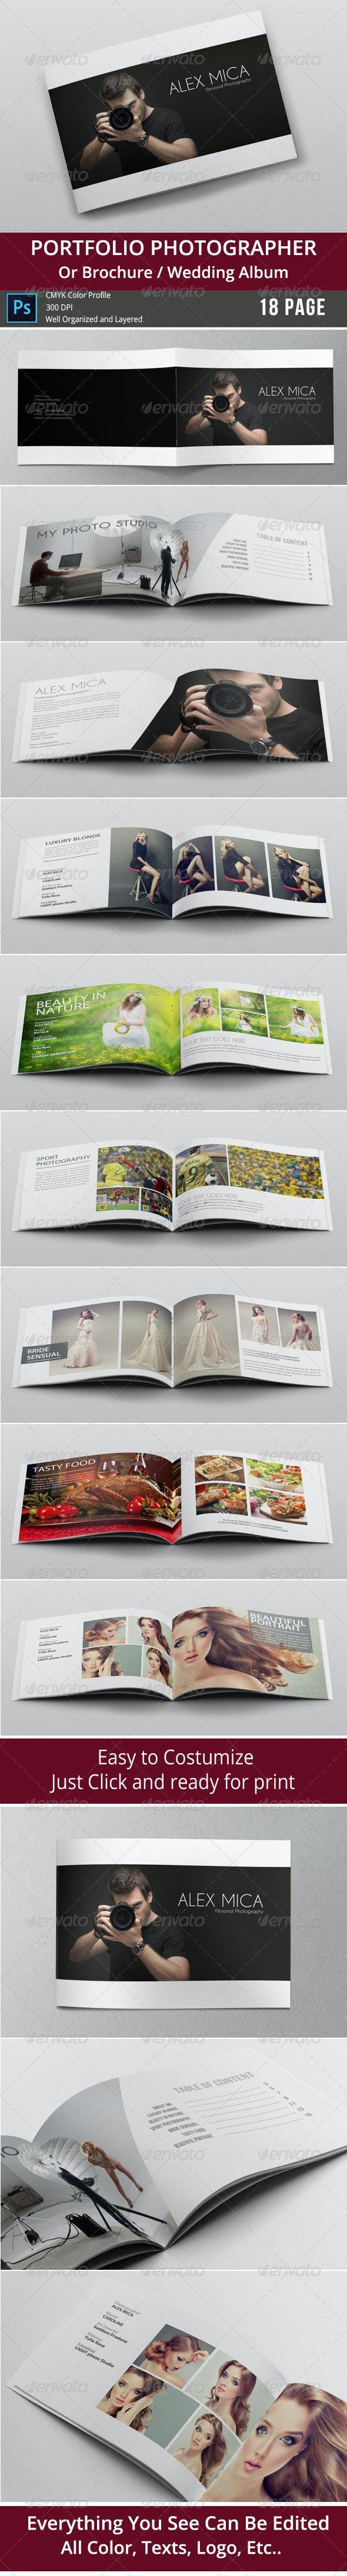 18 Pages Photography Portfolio or Photo Album - Photo Albums Print Templates